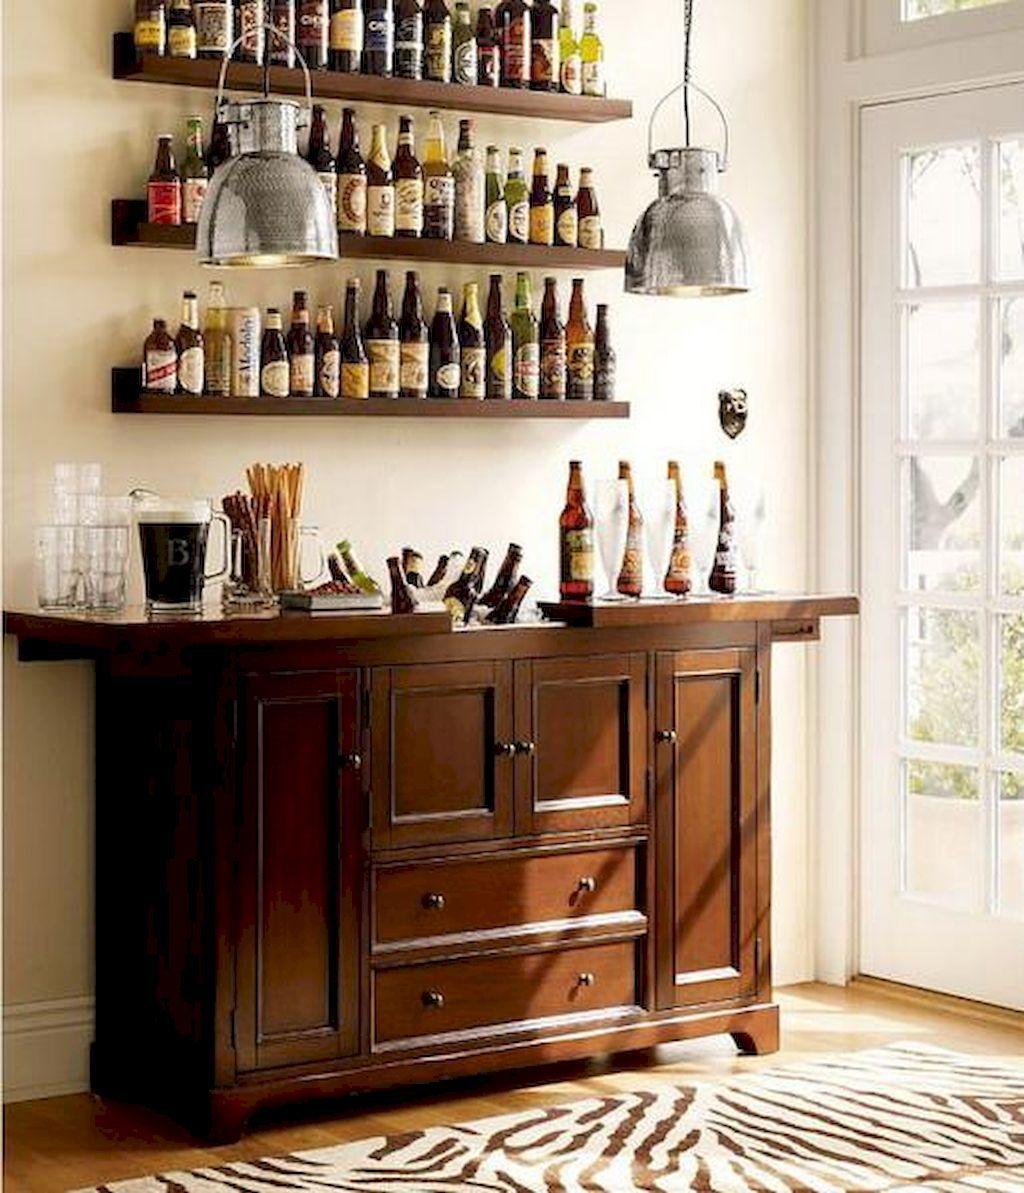 50 affordable apartment coffee bar cart ideas | bar carts